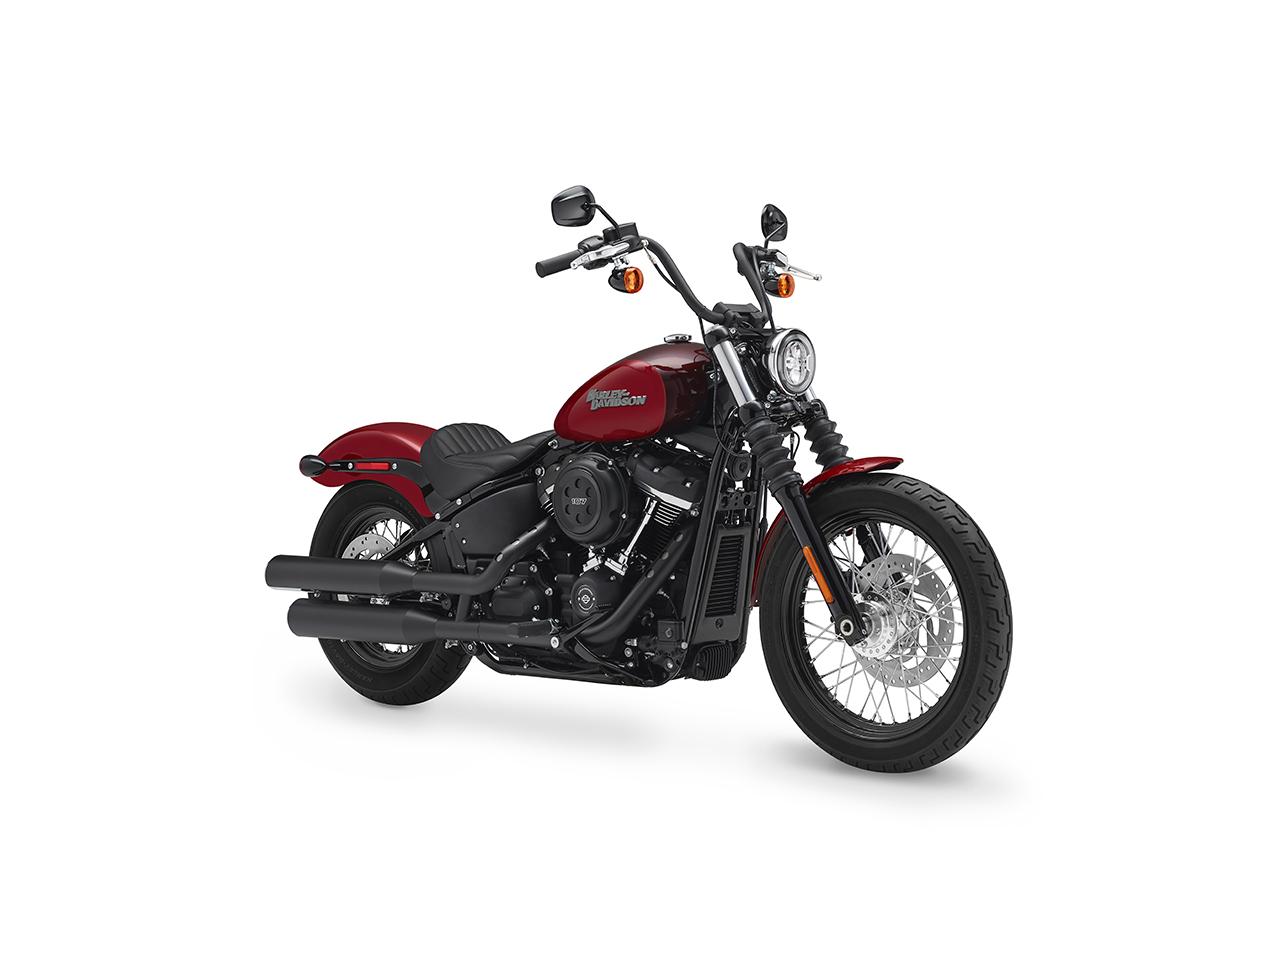 2018 Harley-Davidson Street Bob Image